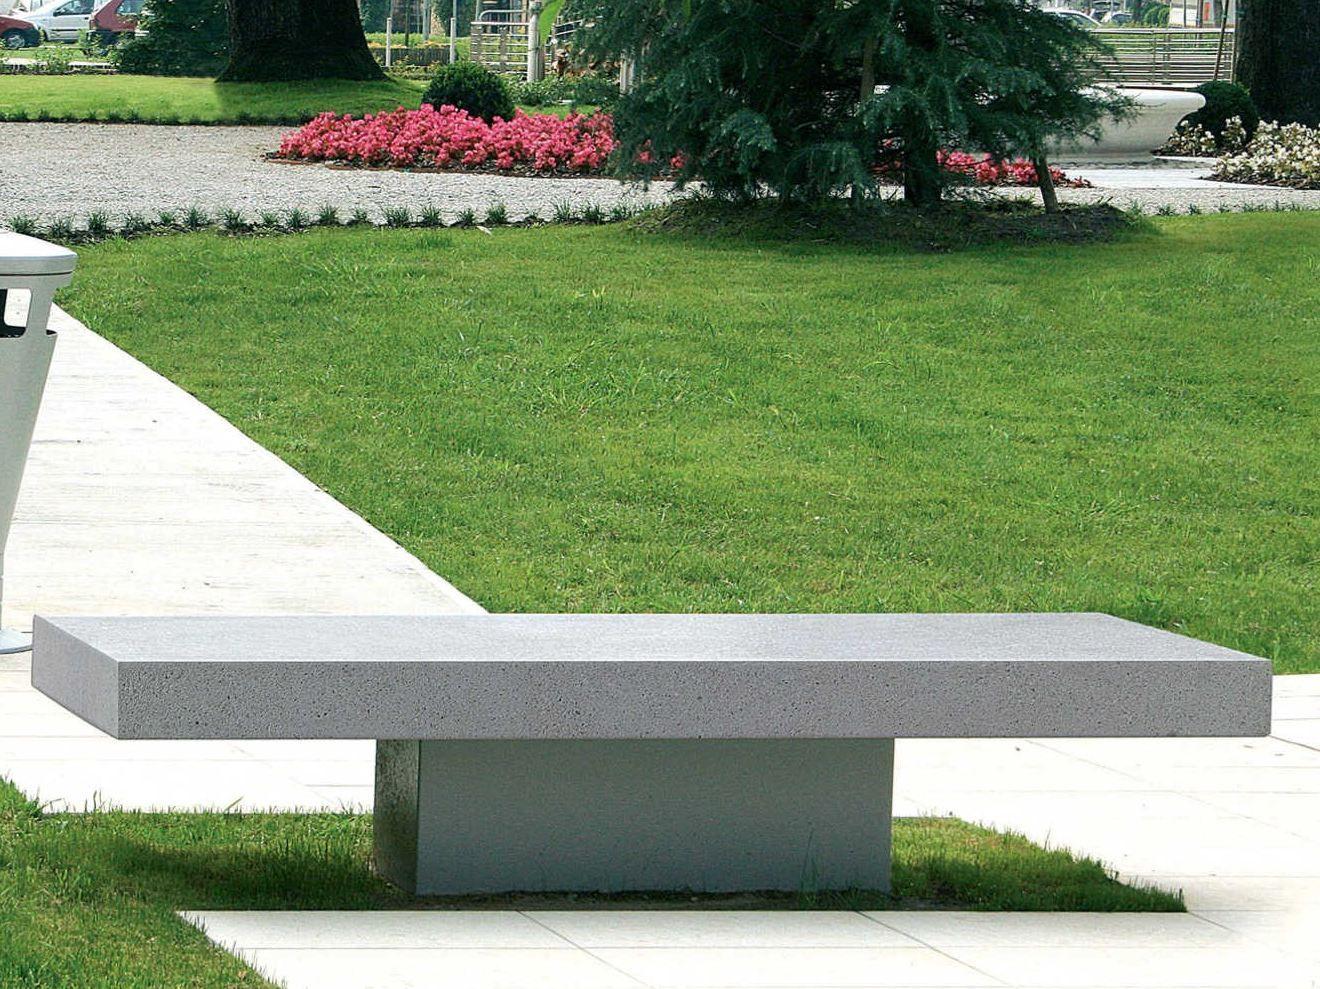 banc en pierre reconstitu e sans dossier agata by metalco design alfredo tasca. Black Bedroom Furniture Sets. Home Design Ideas